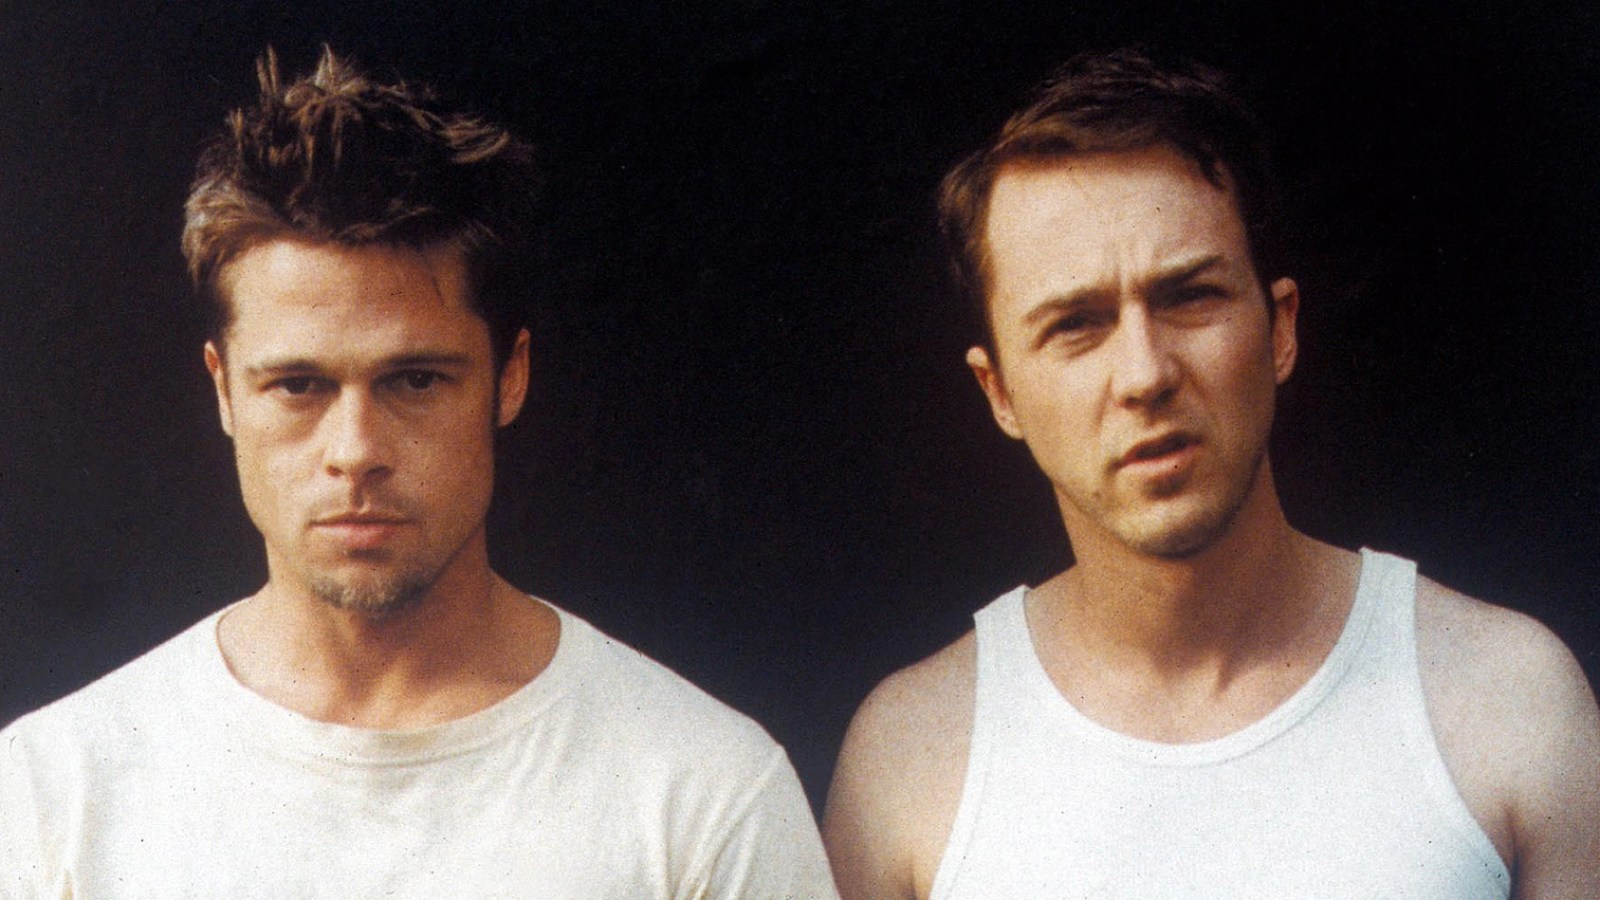 Edward Norton Talks Filming Fight Club With Brad Pitt 20 Years Ago